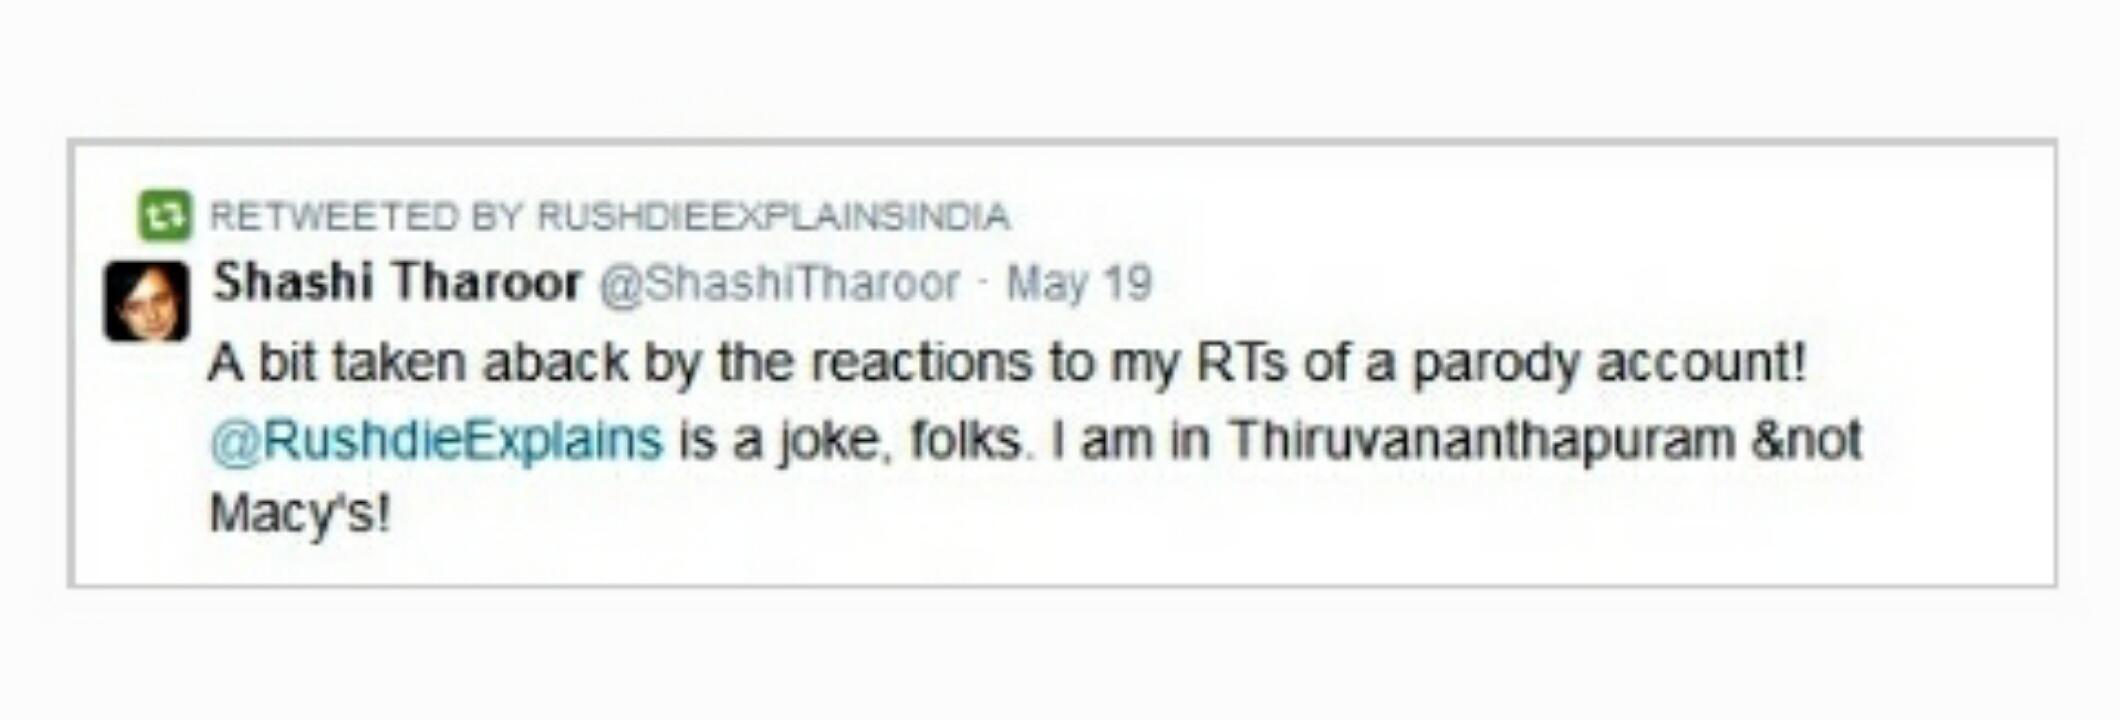 rushdie explains india screenshot 2